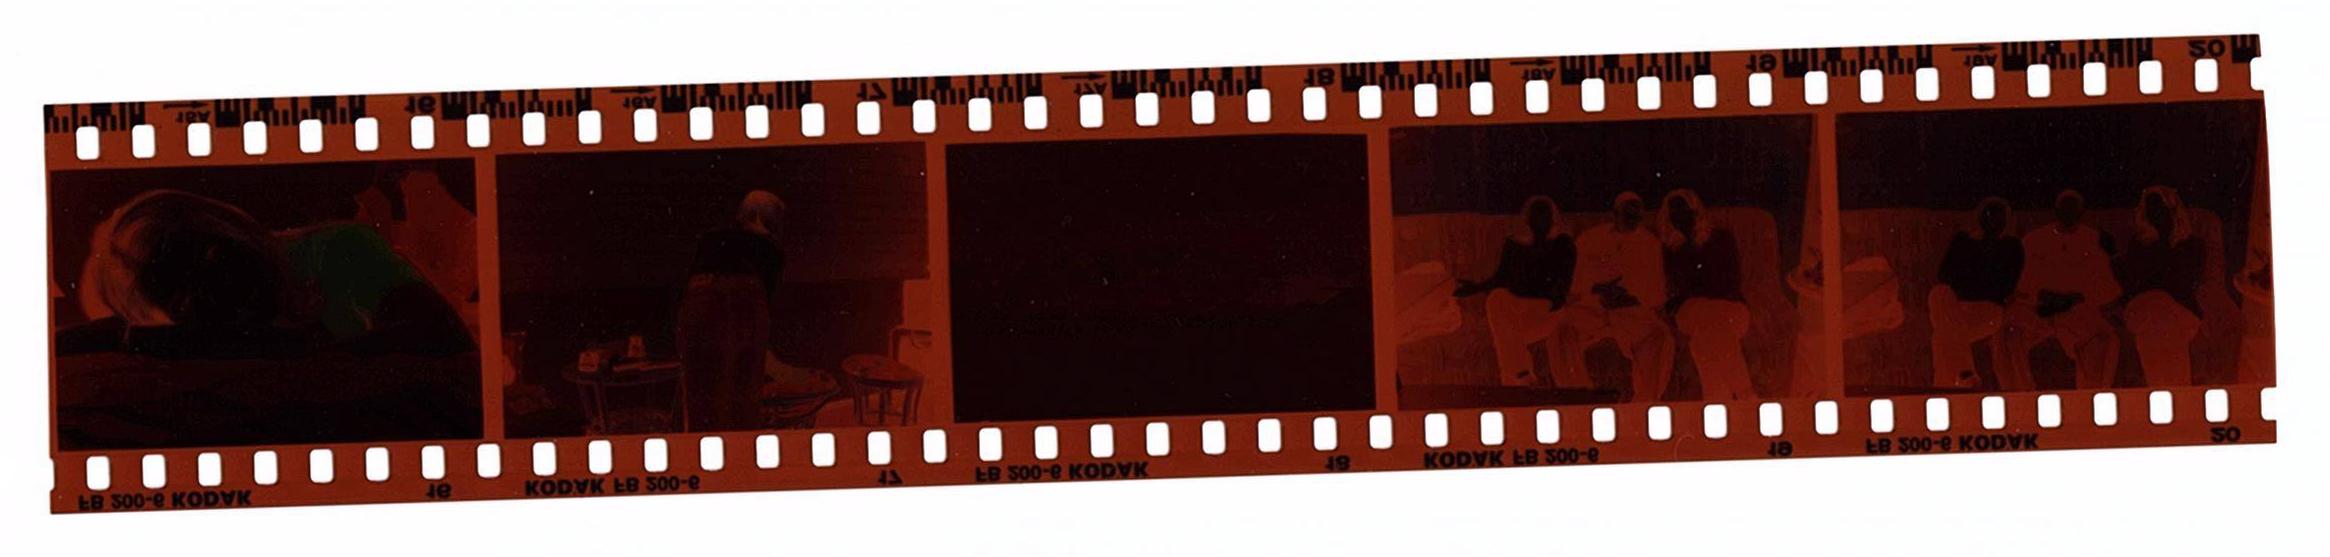 filmstrip1-resize2.jpg